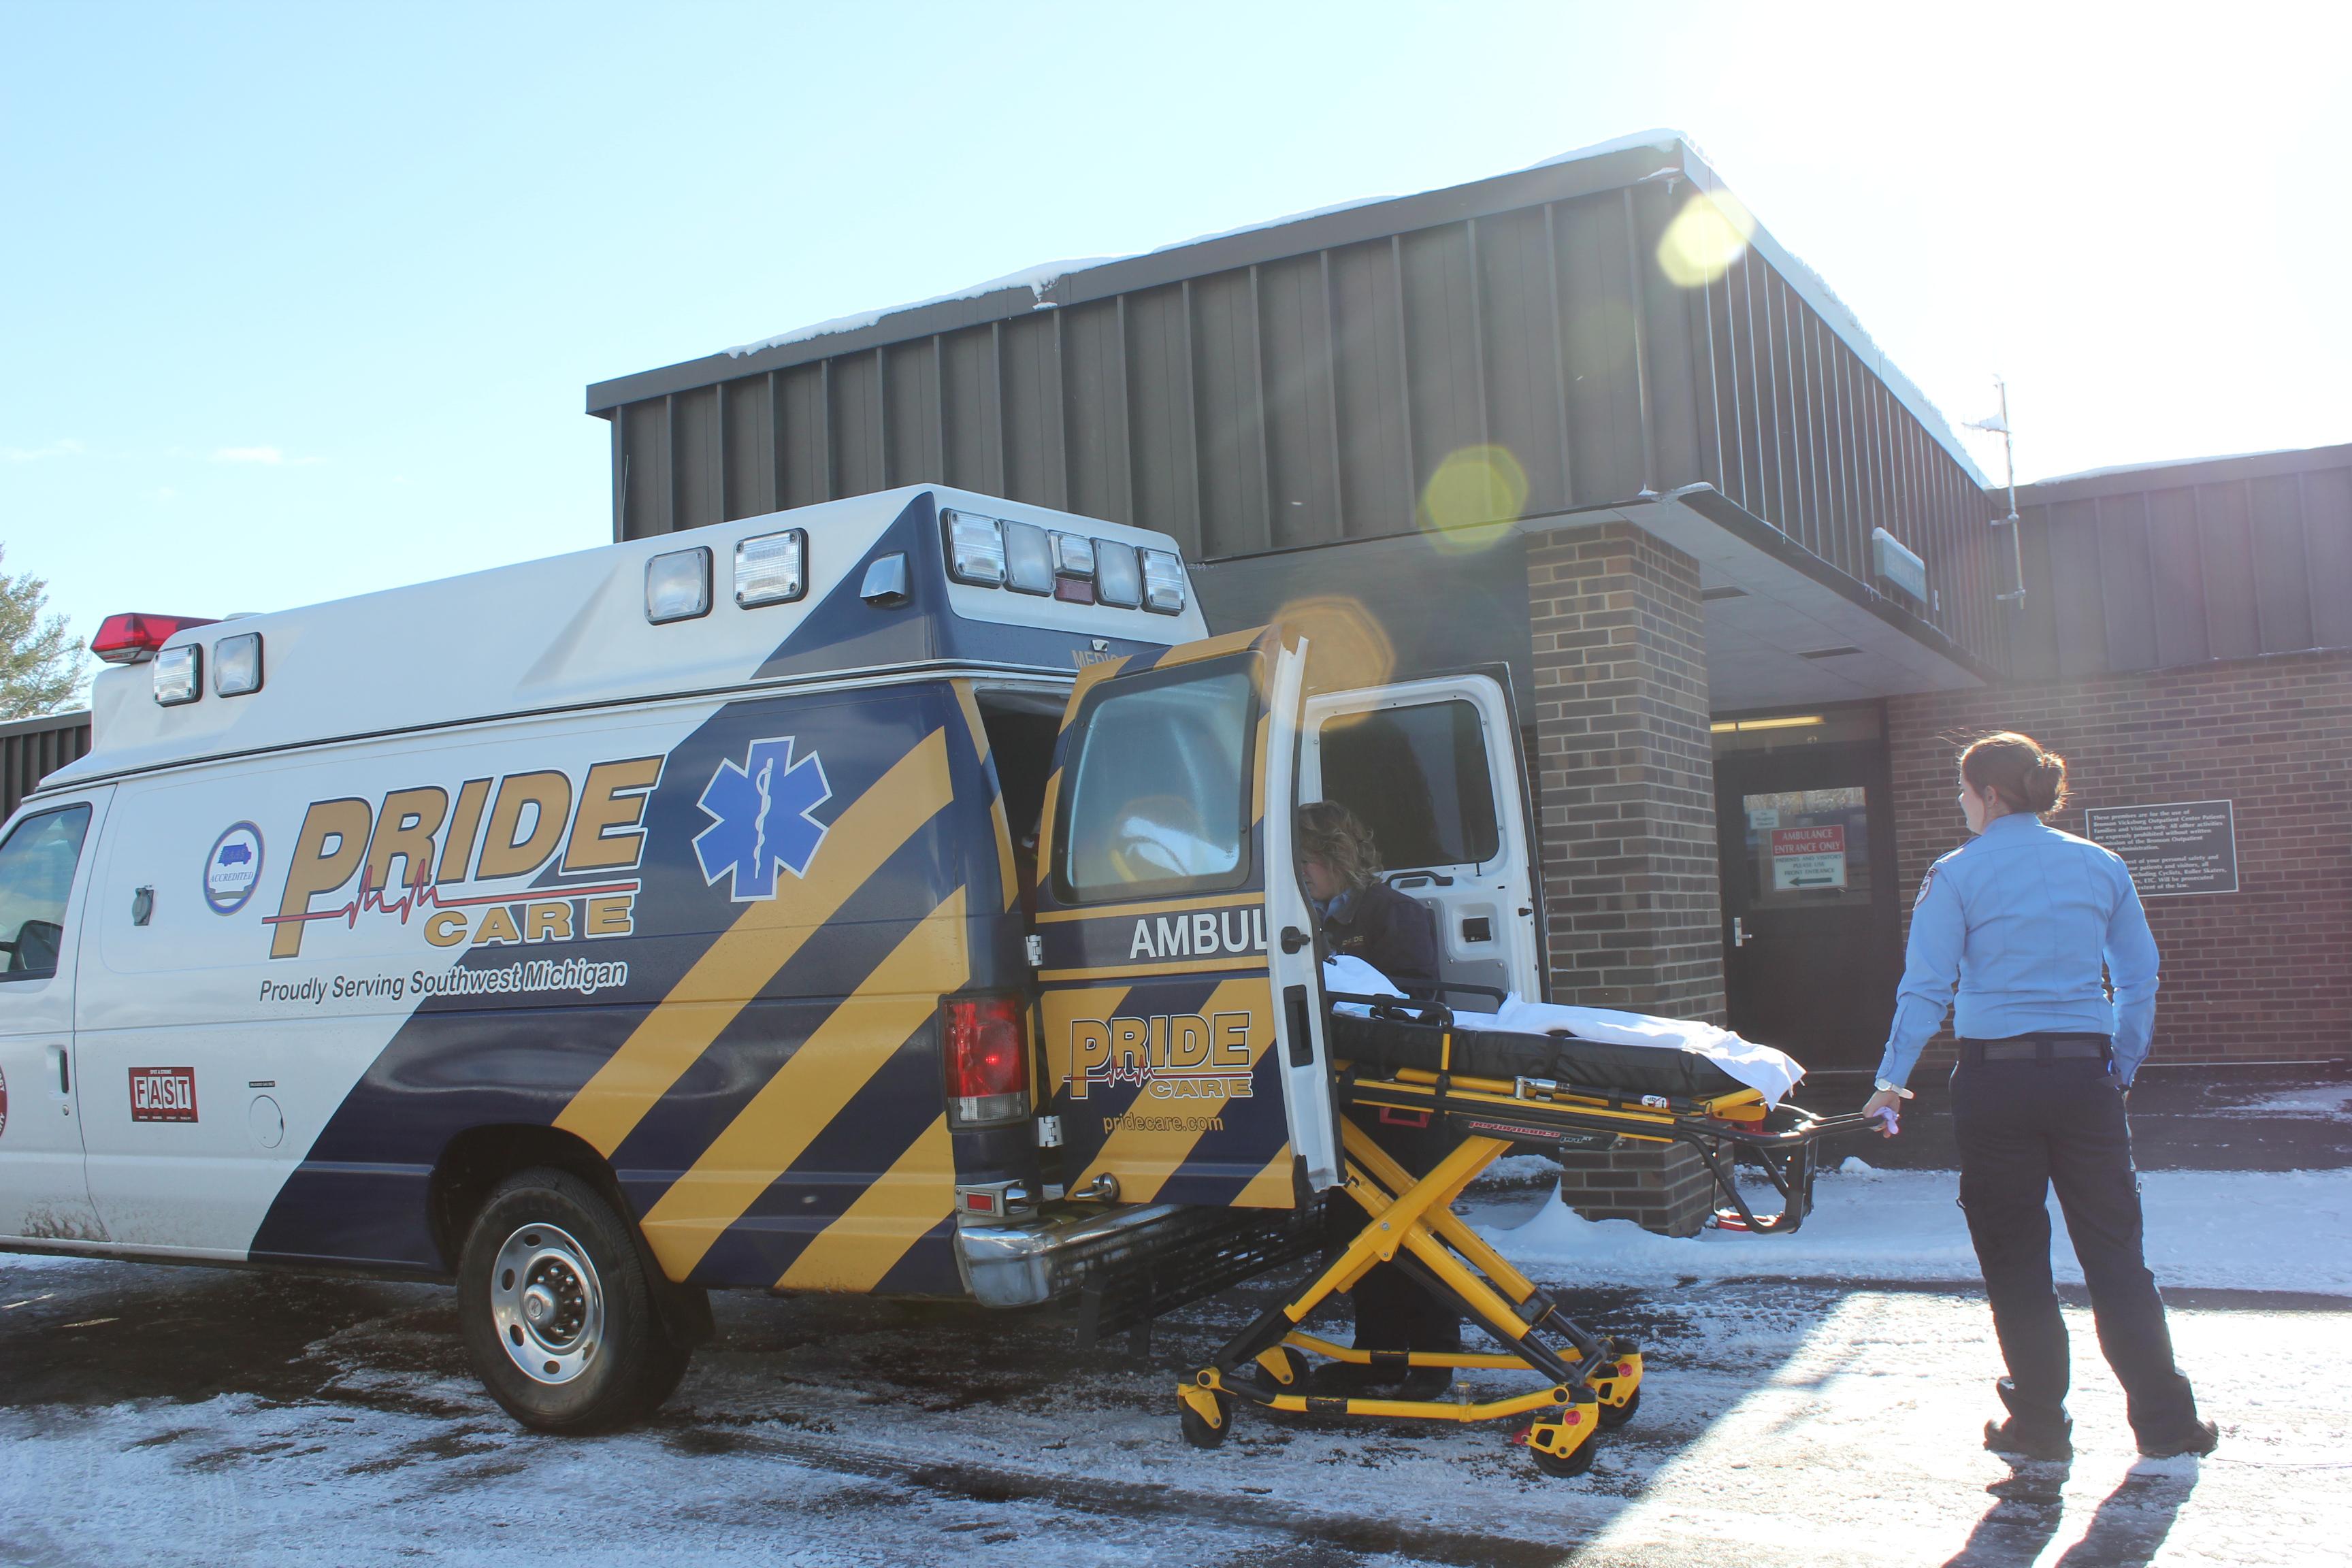 Bronson Emergency Room Kalamazoo Michigan